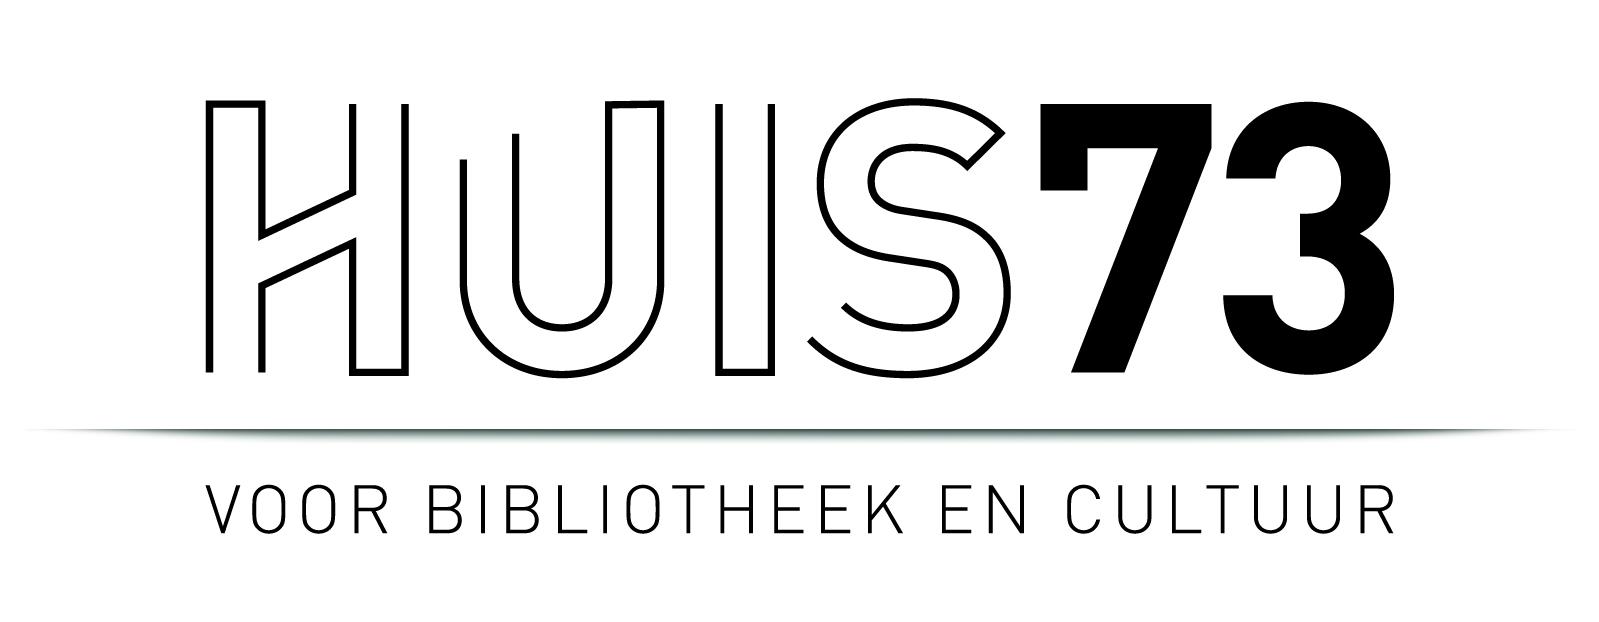 LOGO_HUIS73_met slogan.jpg (803817 bytes)